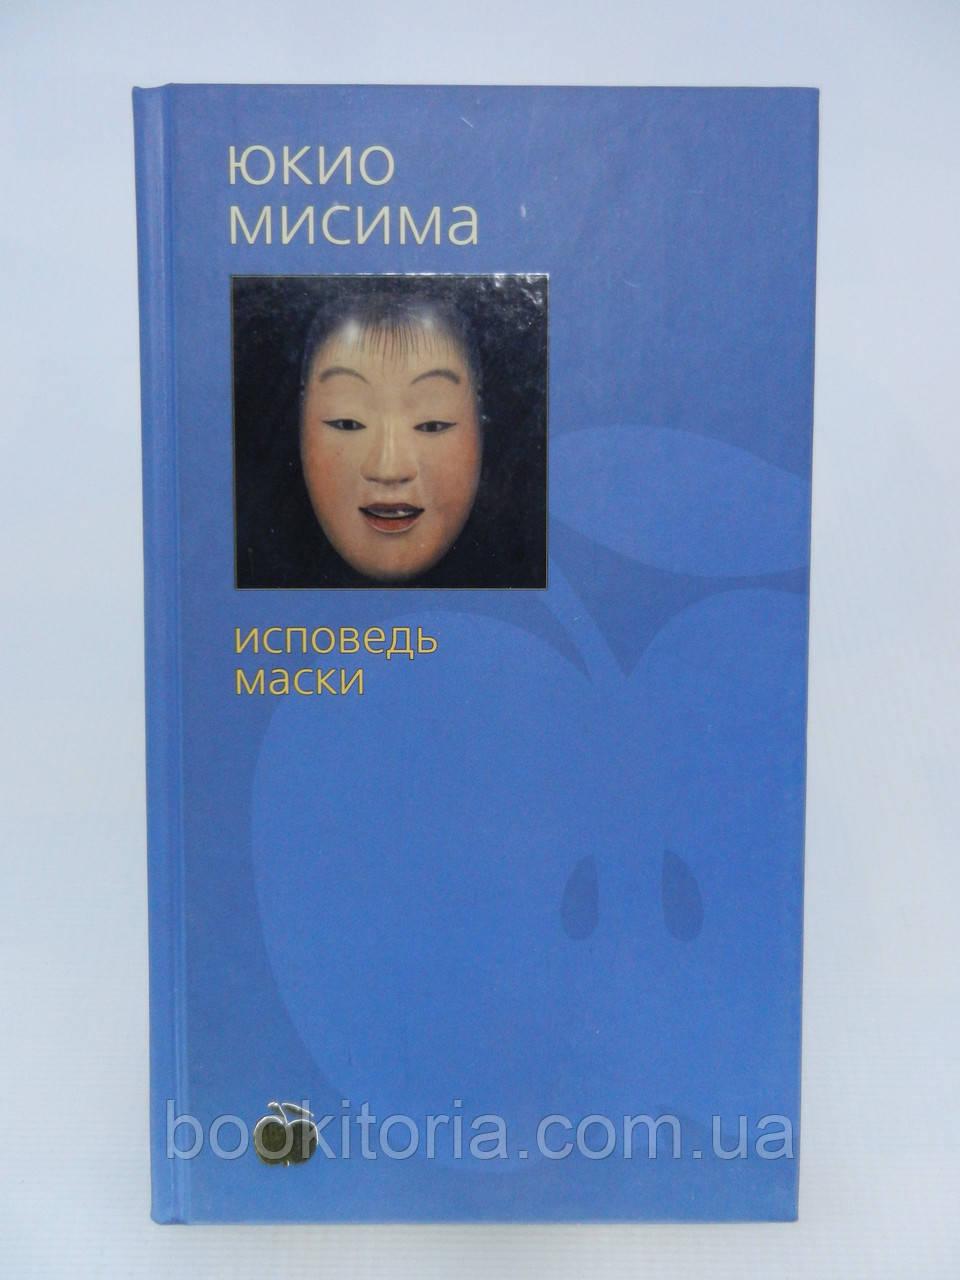 Мисима Ю. Исповедь маски (б/у).